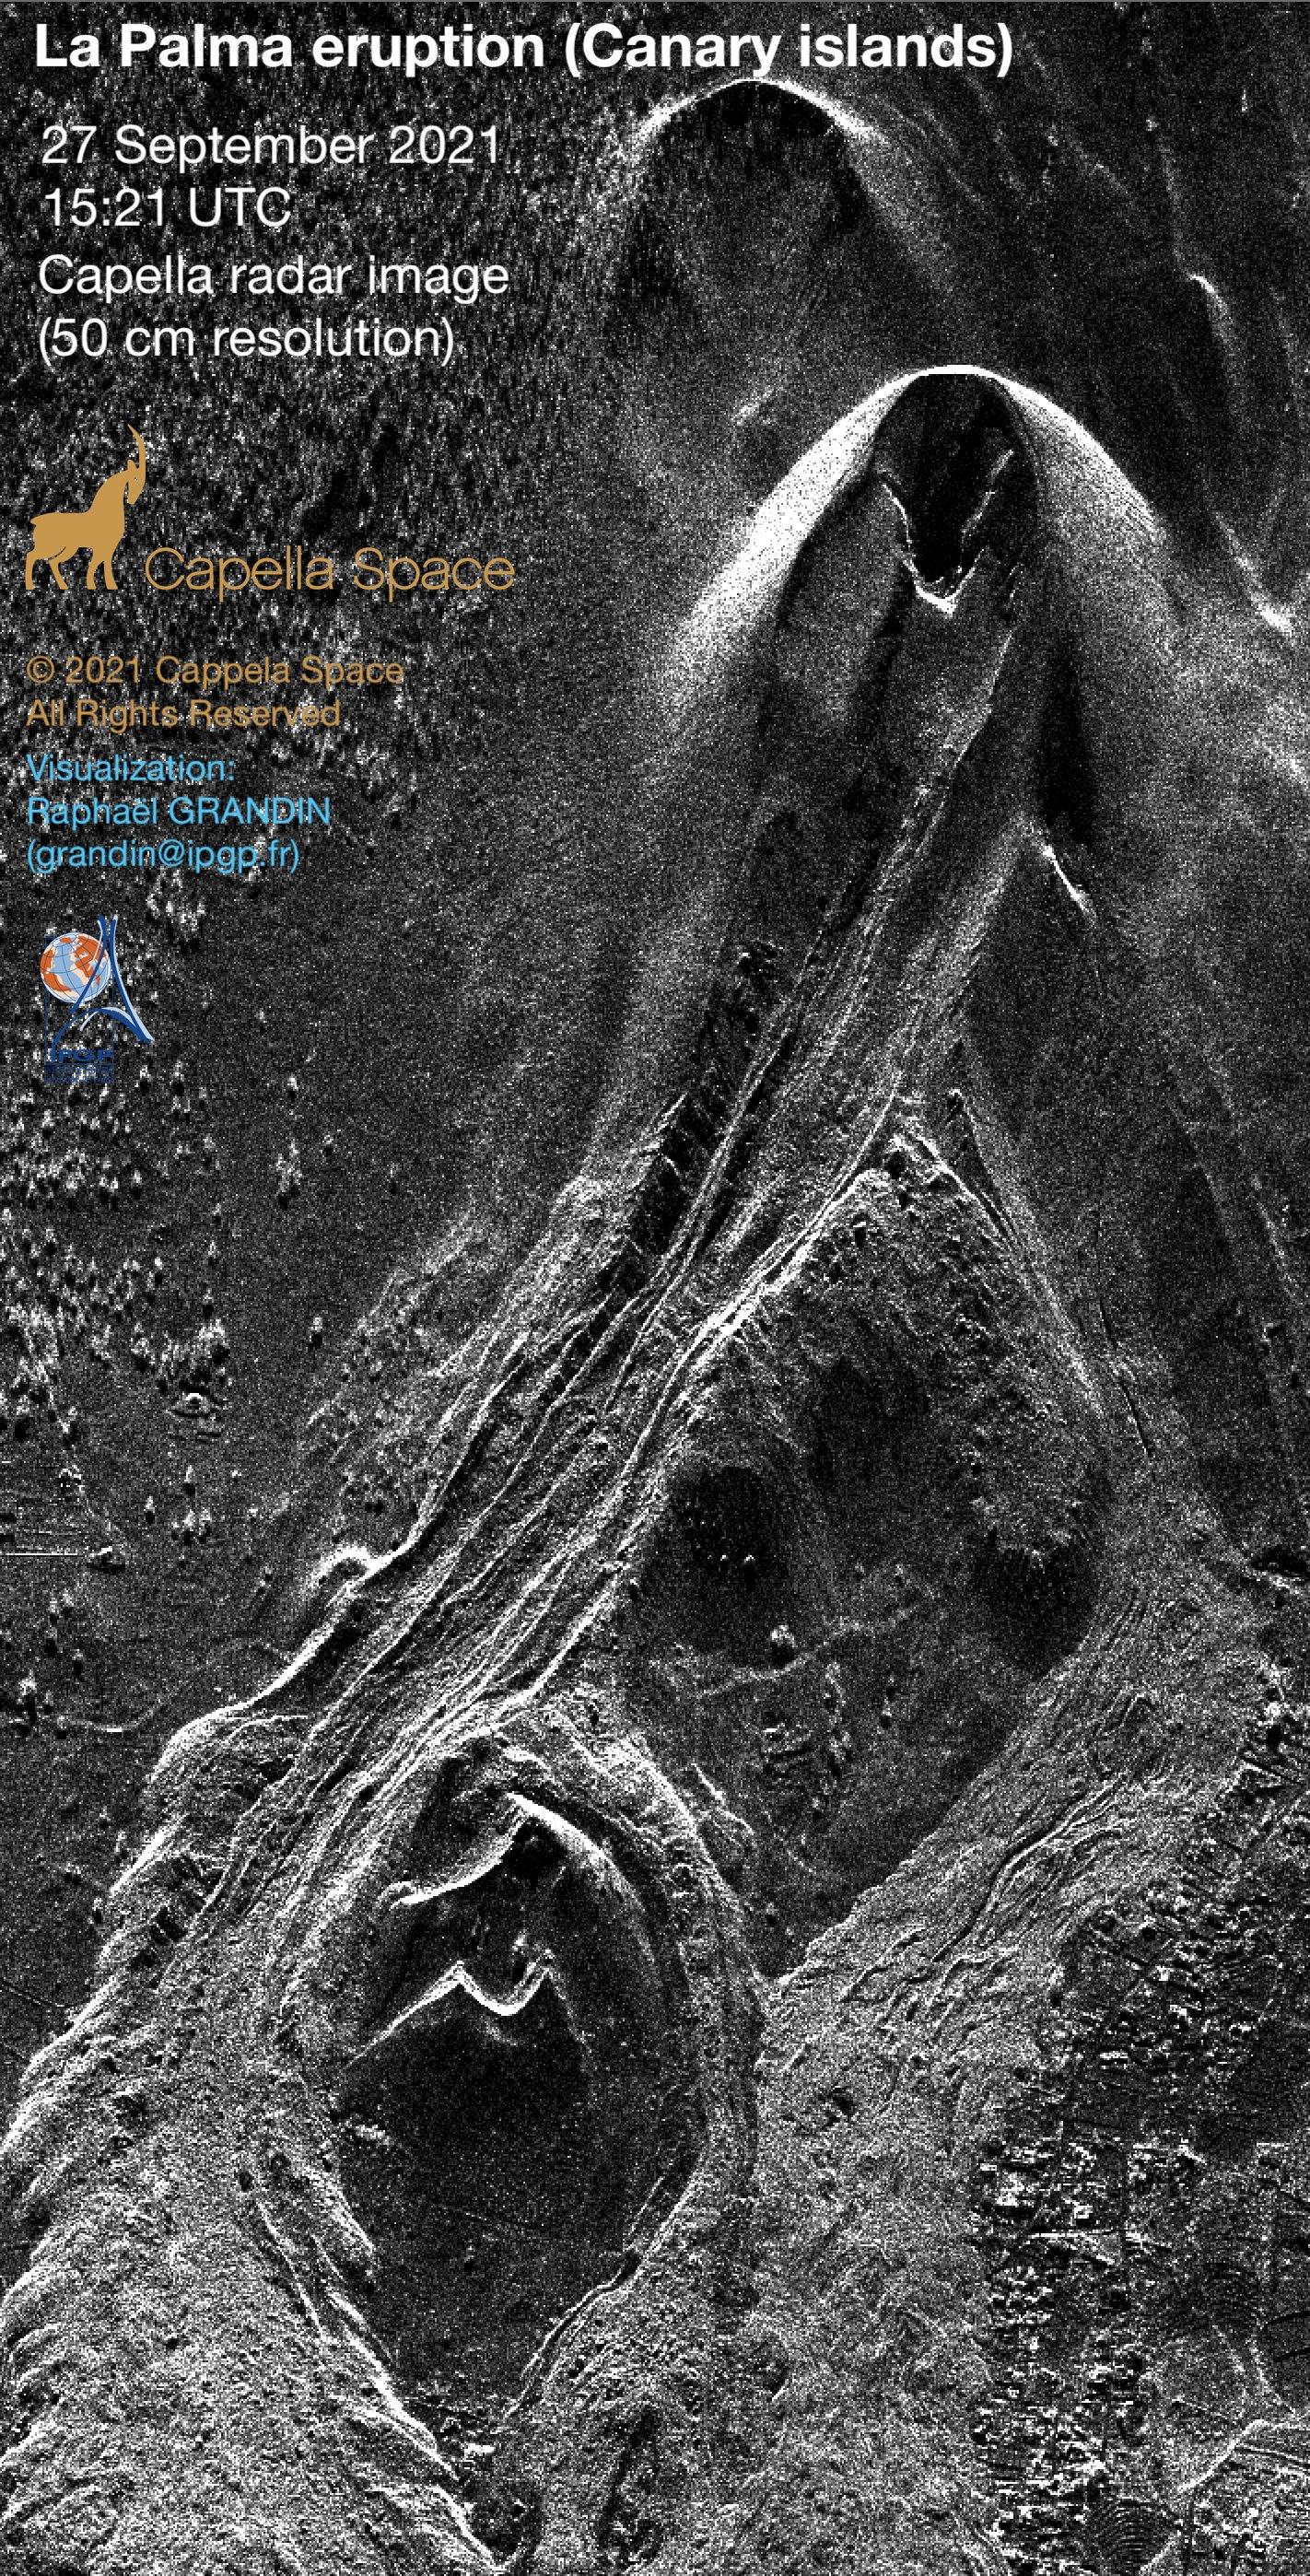 Radar image of the current La Palma eruption (image: Capella Space/twitter)